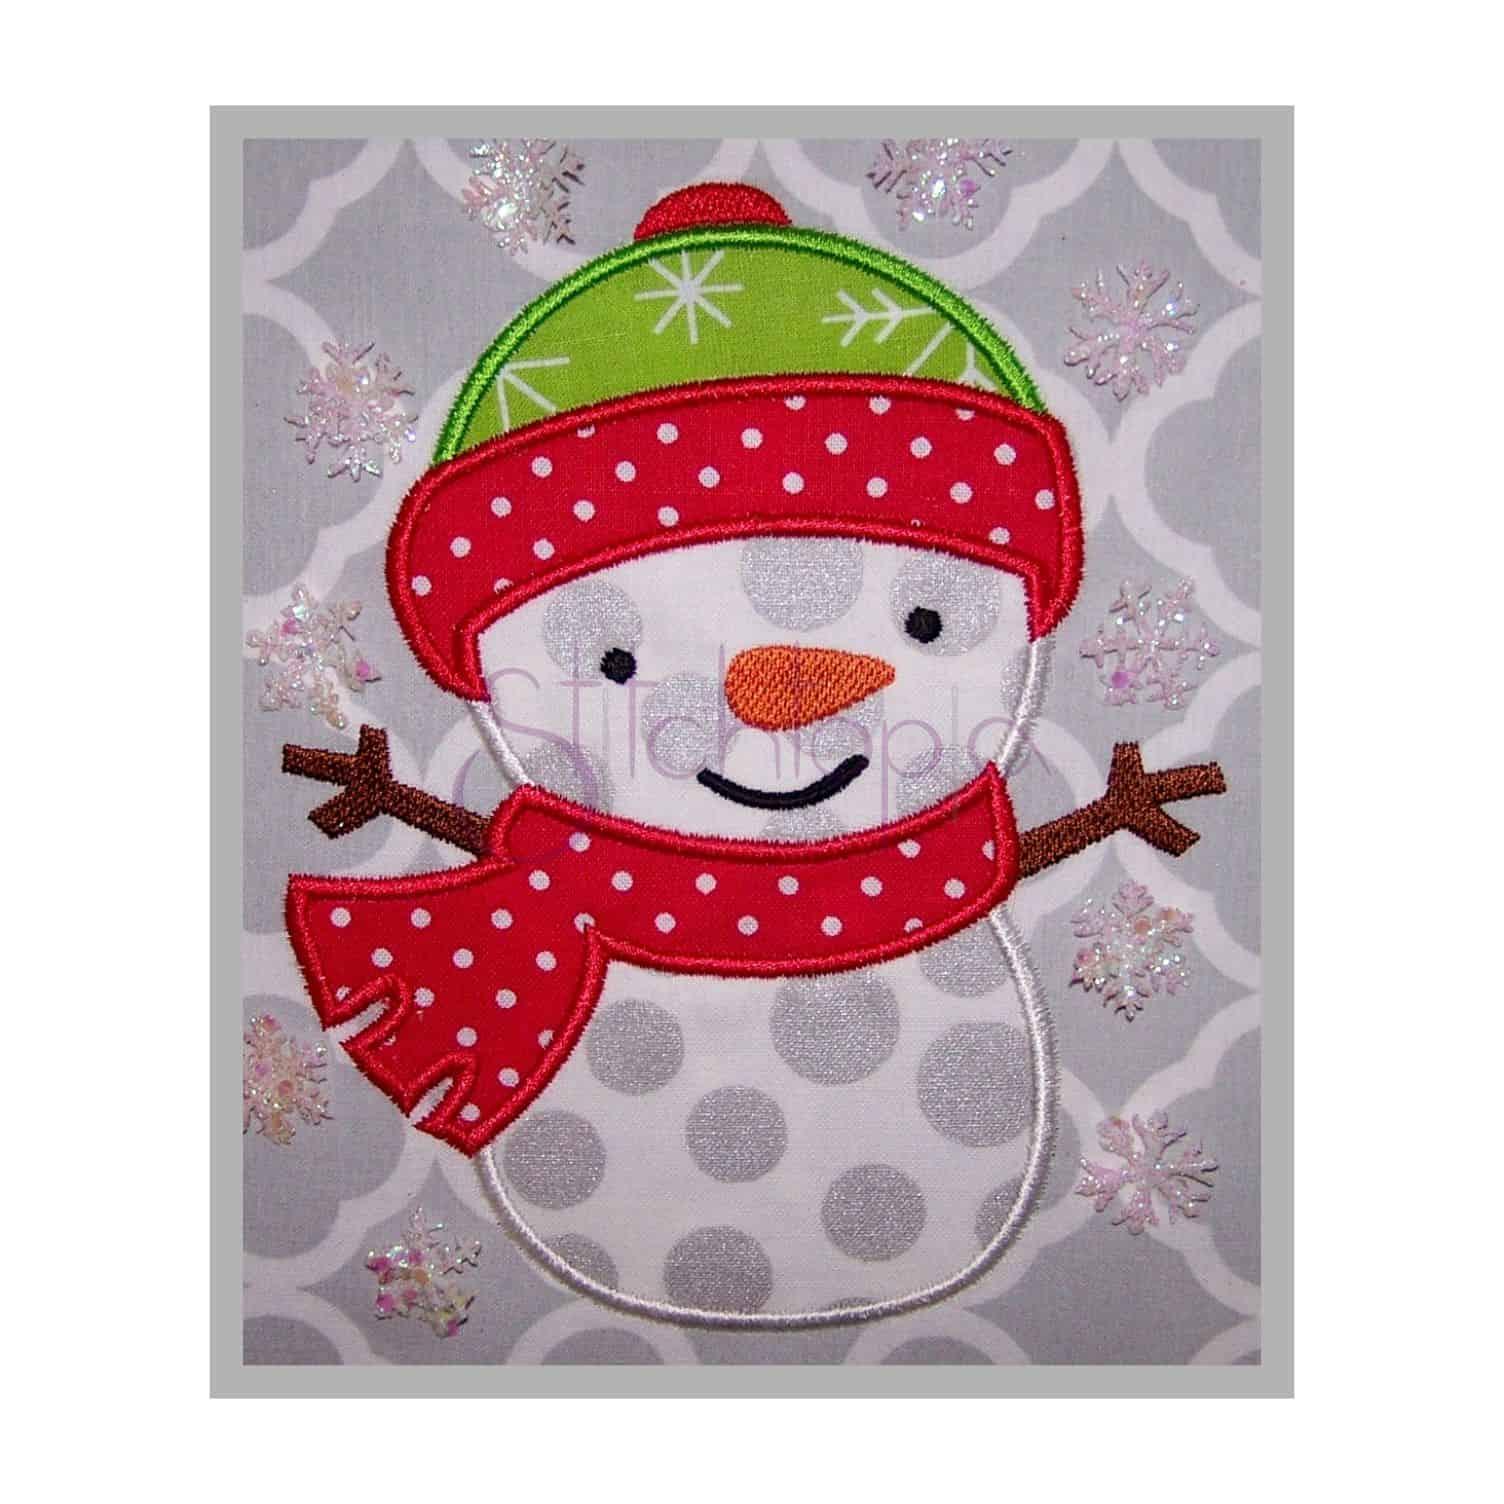 Snowman applique design stitchtopia